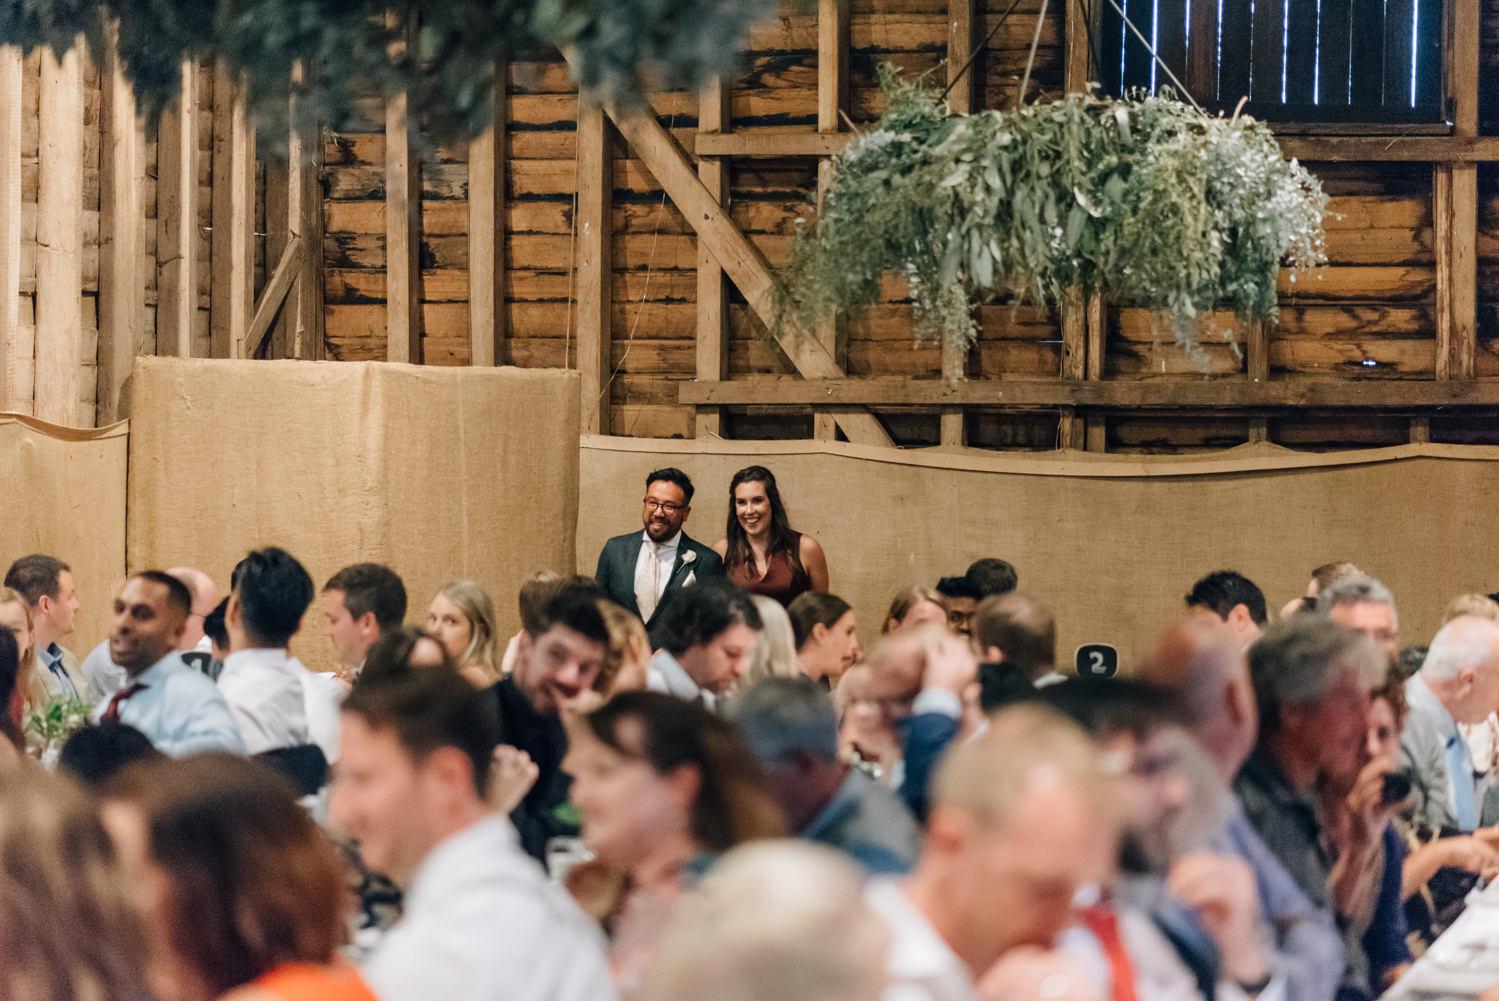 Brickendon-Wedding-Photographer-120.jpg